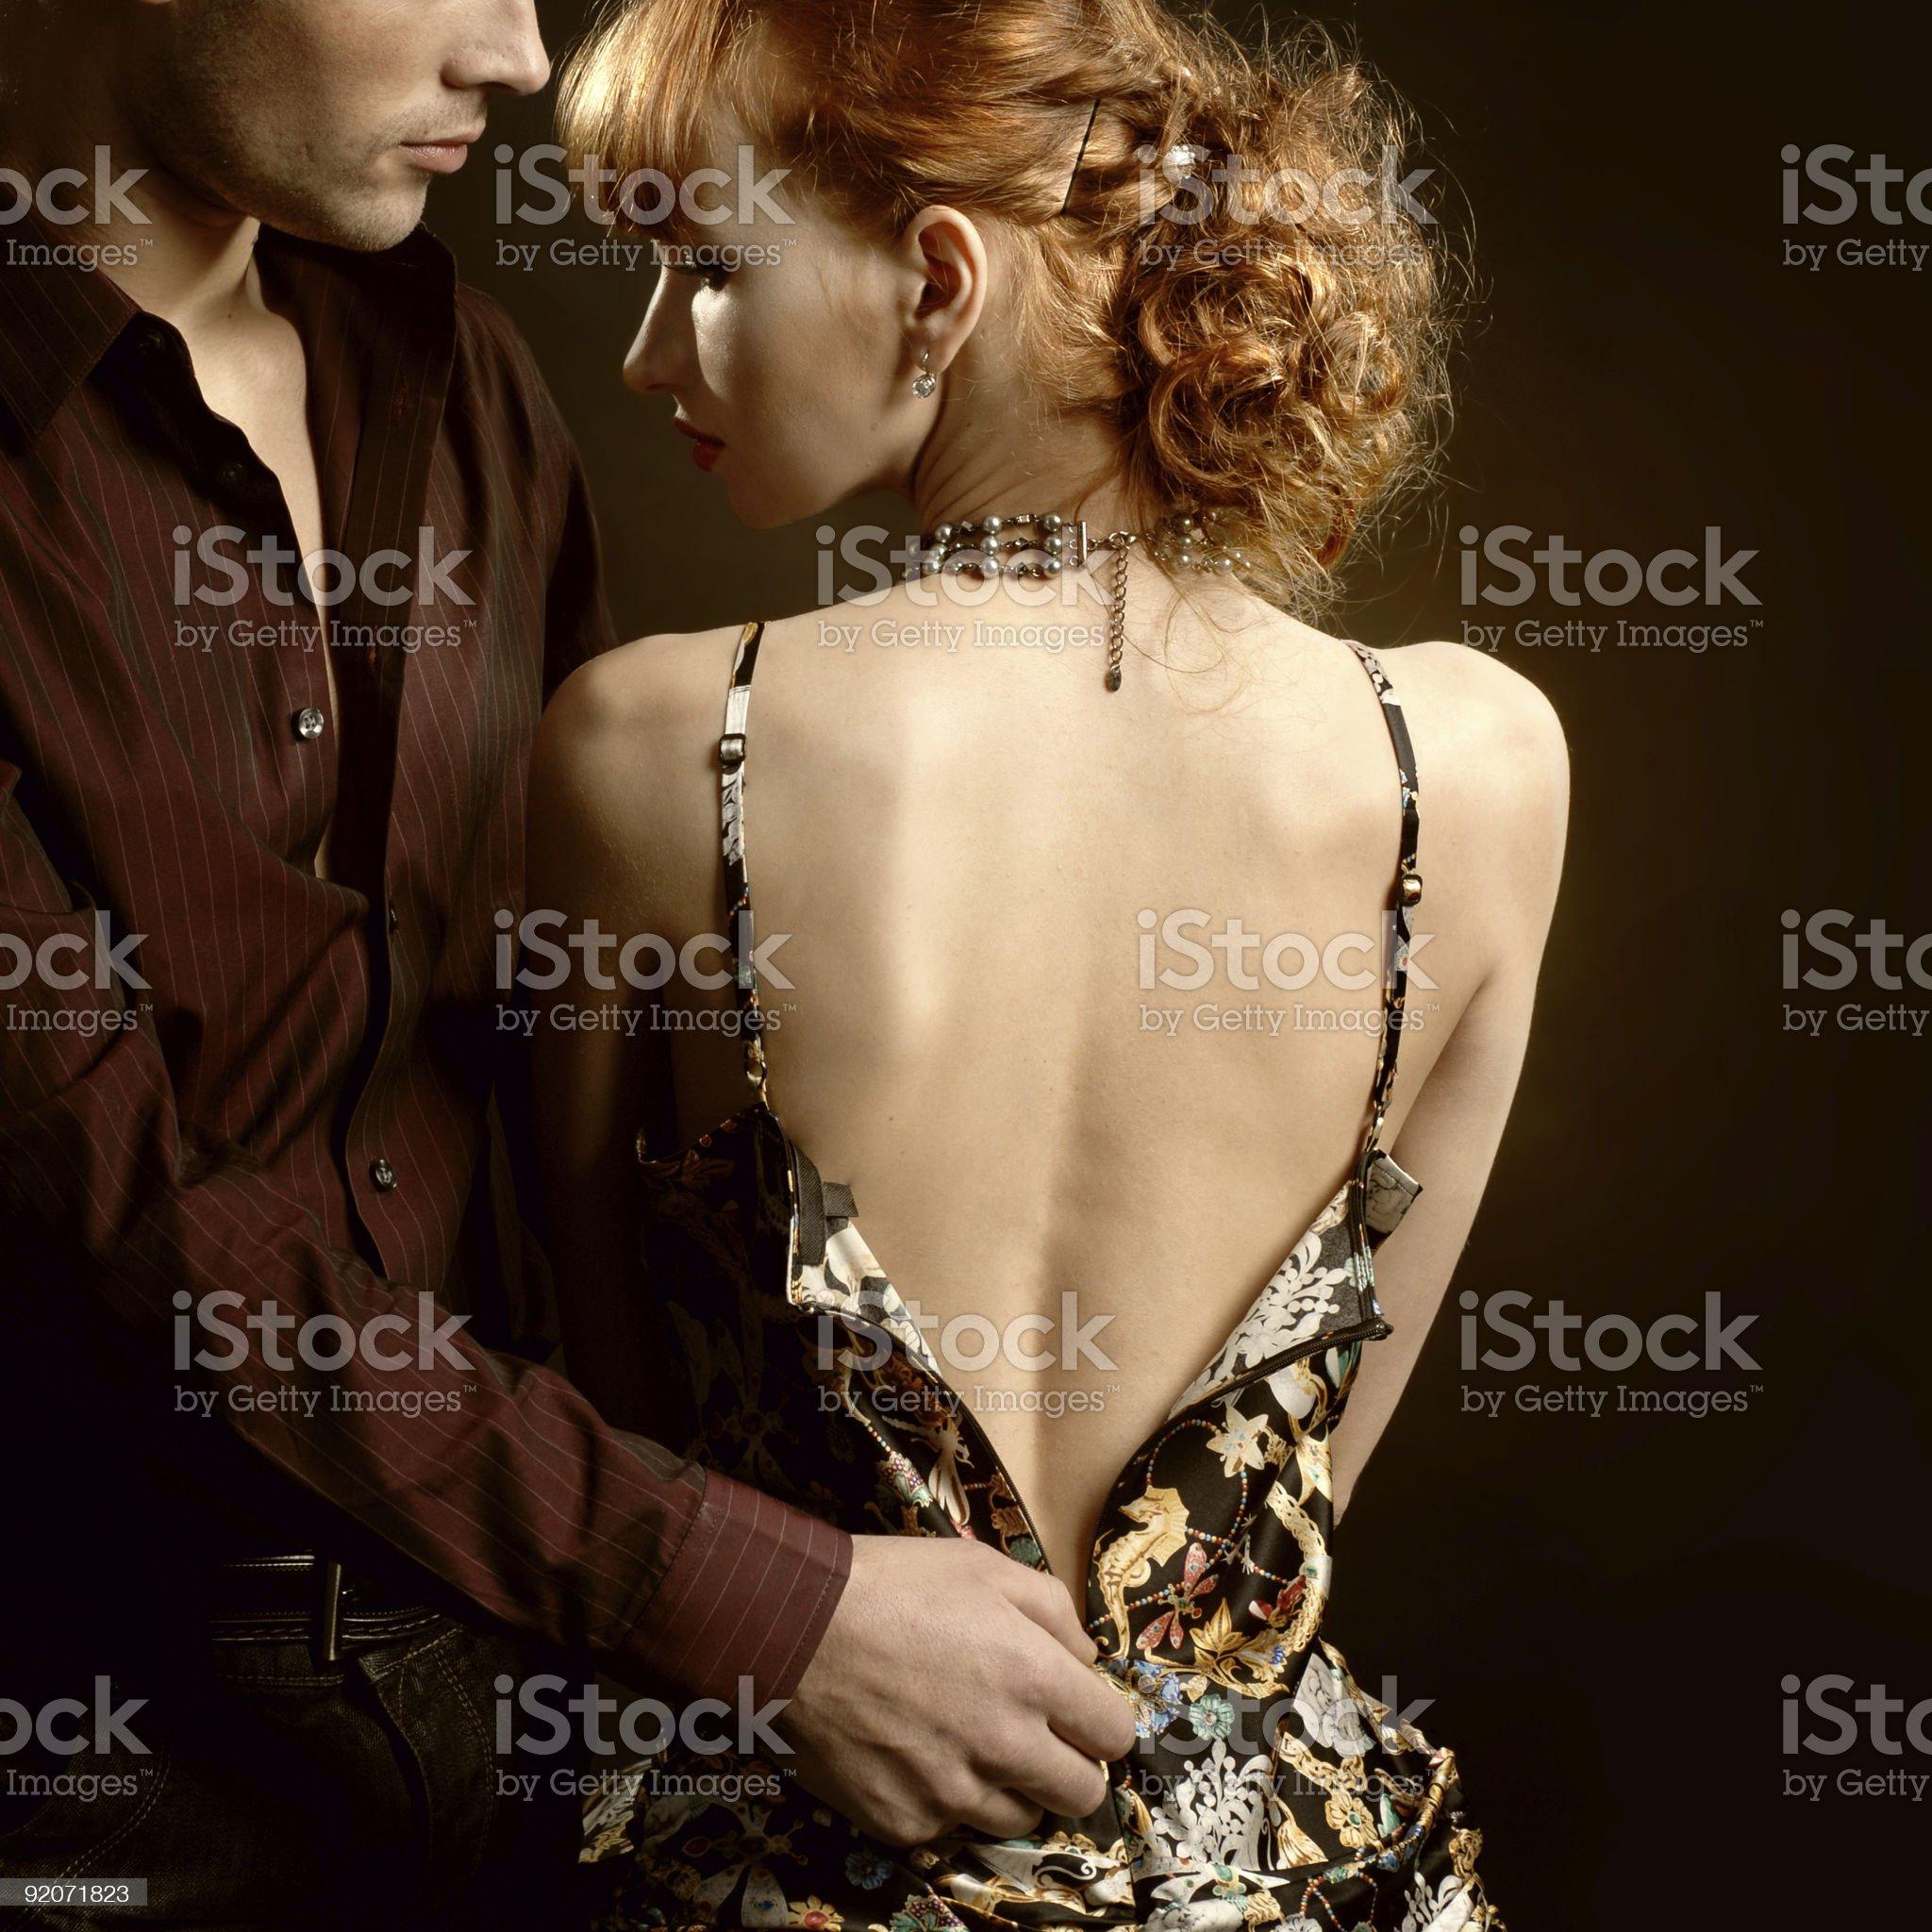 Man undress woman royalty-free stock photo